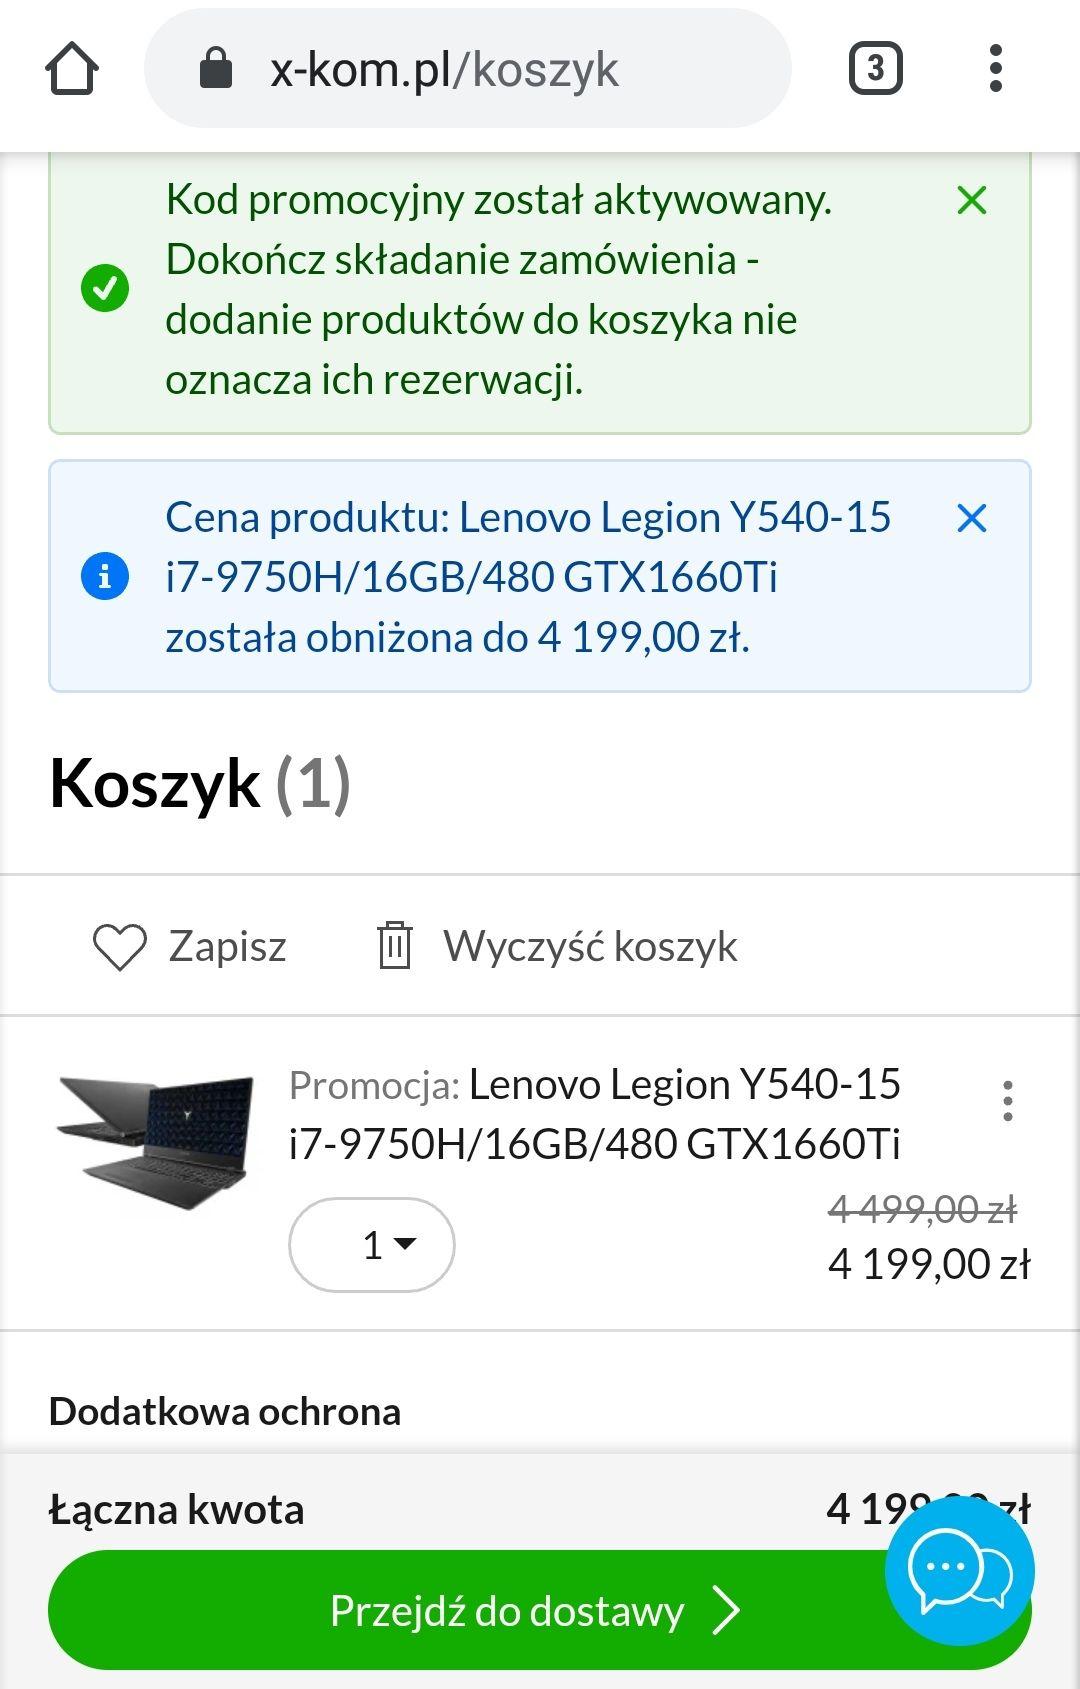 Lenovo Legion Y540-15 i7-9750H/16GB/480 GTX1660Ti - Do 12% rabatu w X-kom na wybrane laptopy Lenovo